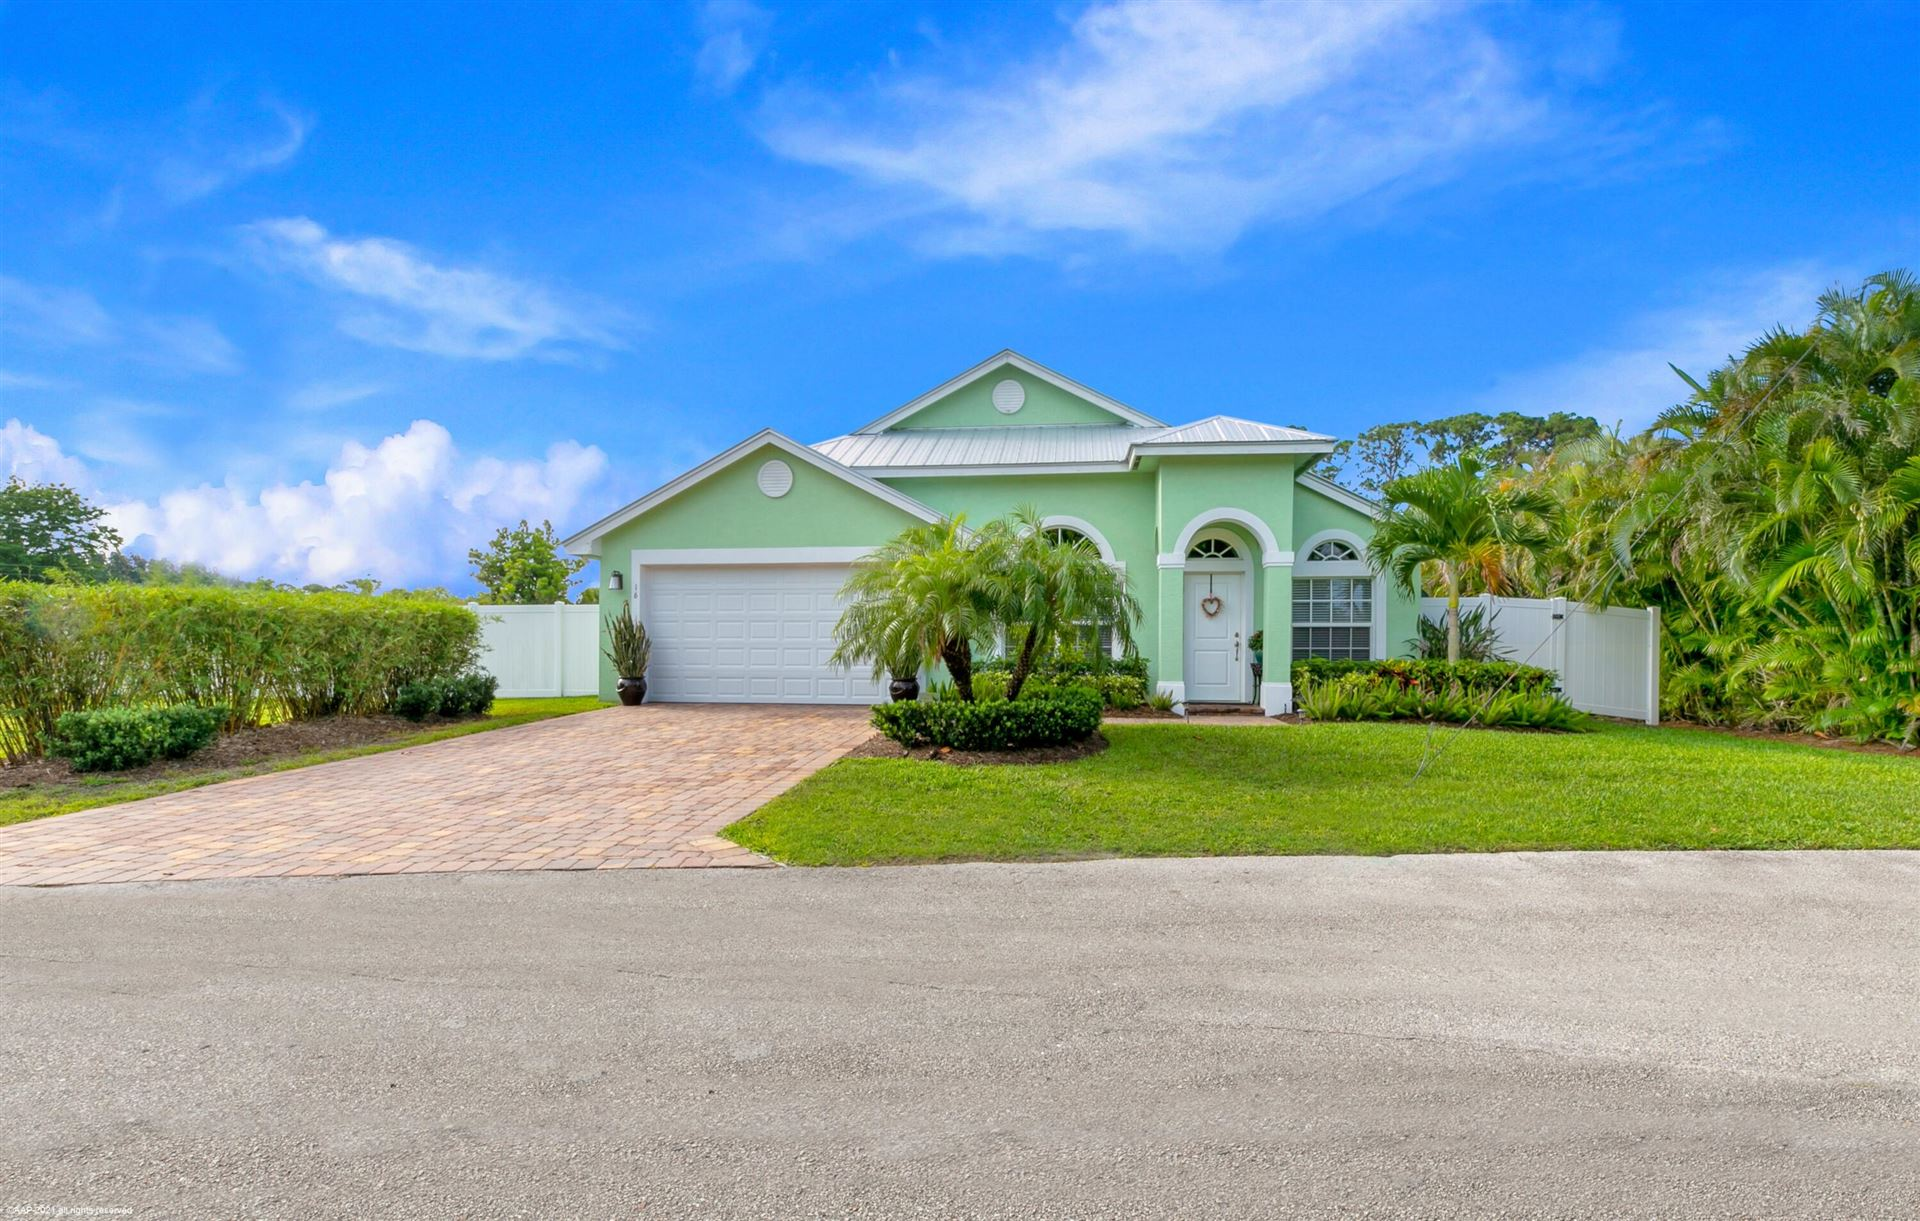 16 SW Cabana Point Circle, Stuart, FL 34994 - MLS#: RX-10719252